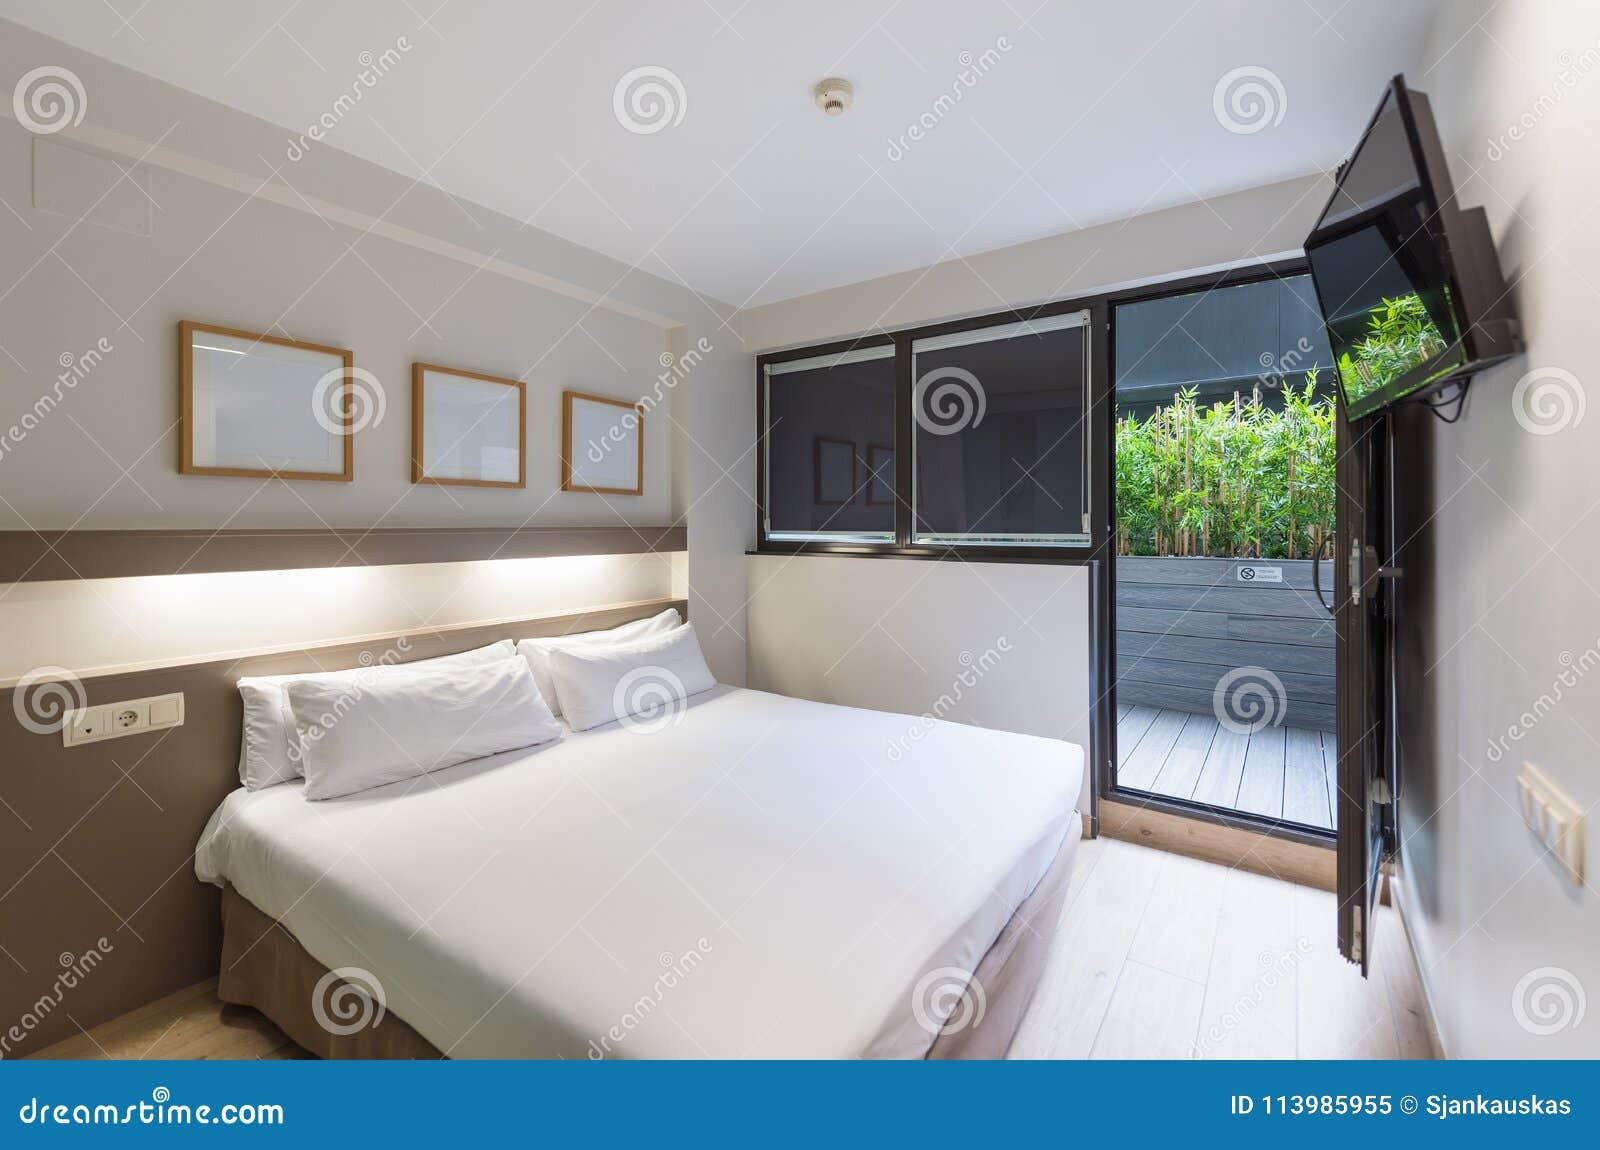 Modern Hotel Double Room With Balcony Interior Design Stock Image Image Of Balcony Hotel 113985955